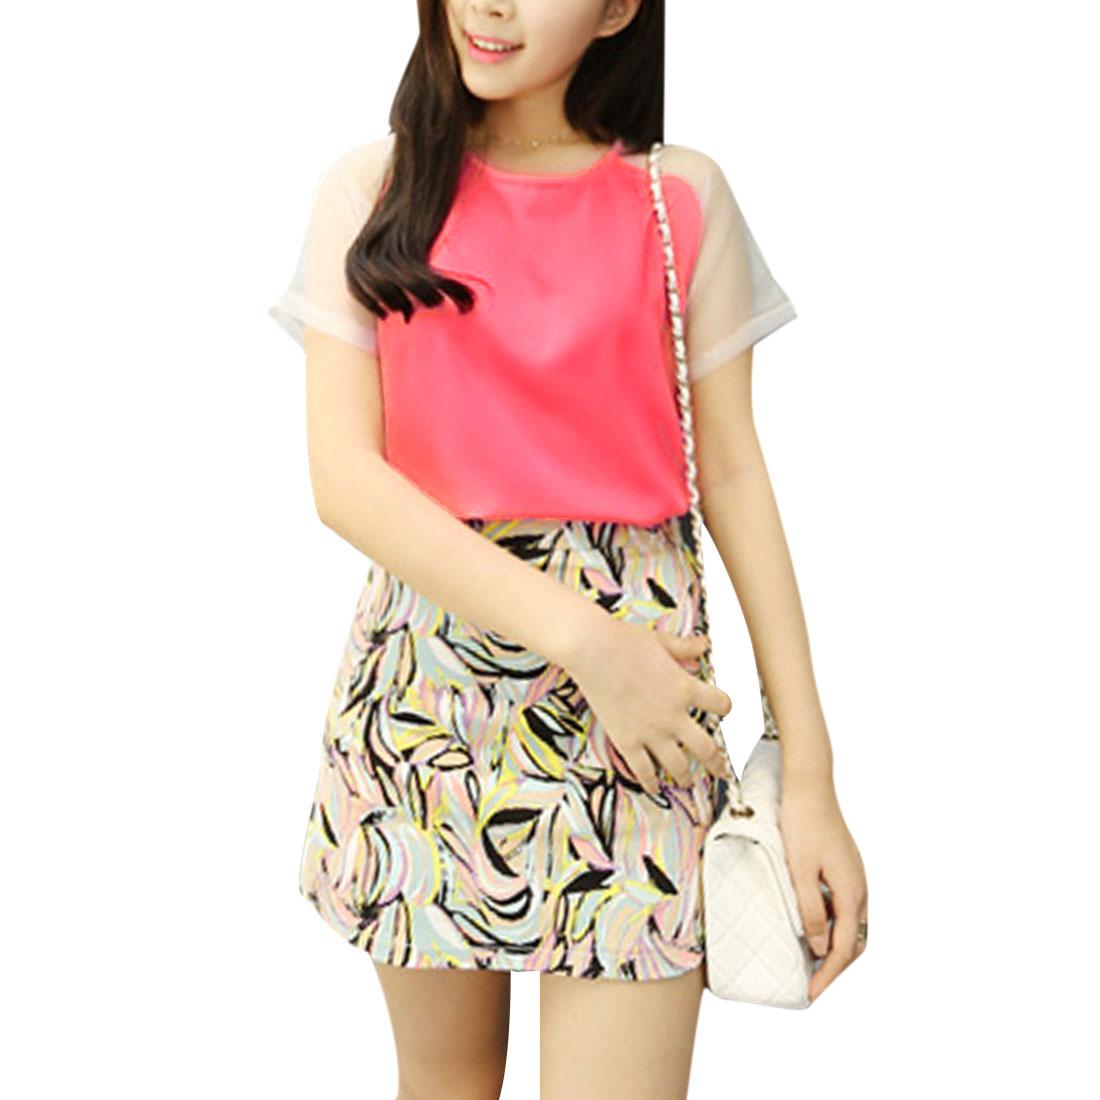 Ladies Chic Round Neck Semi-Sheer Mesh Short Raglan Sleeve Pink Casual Tops XS